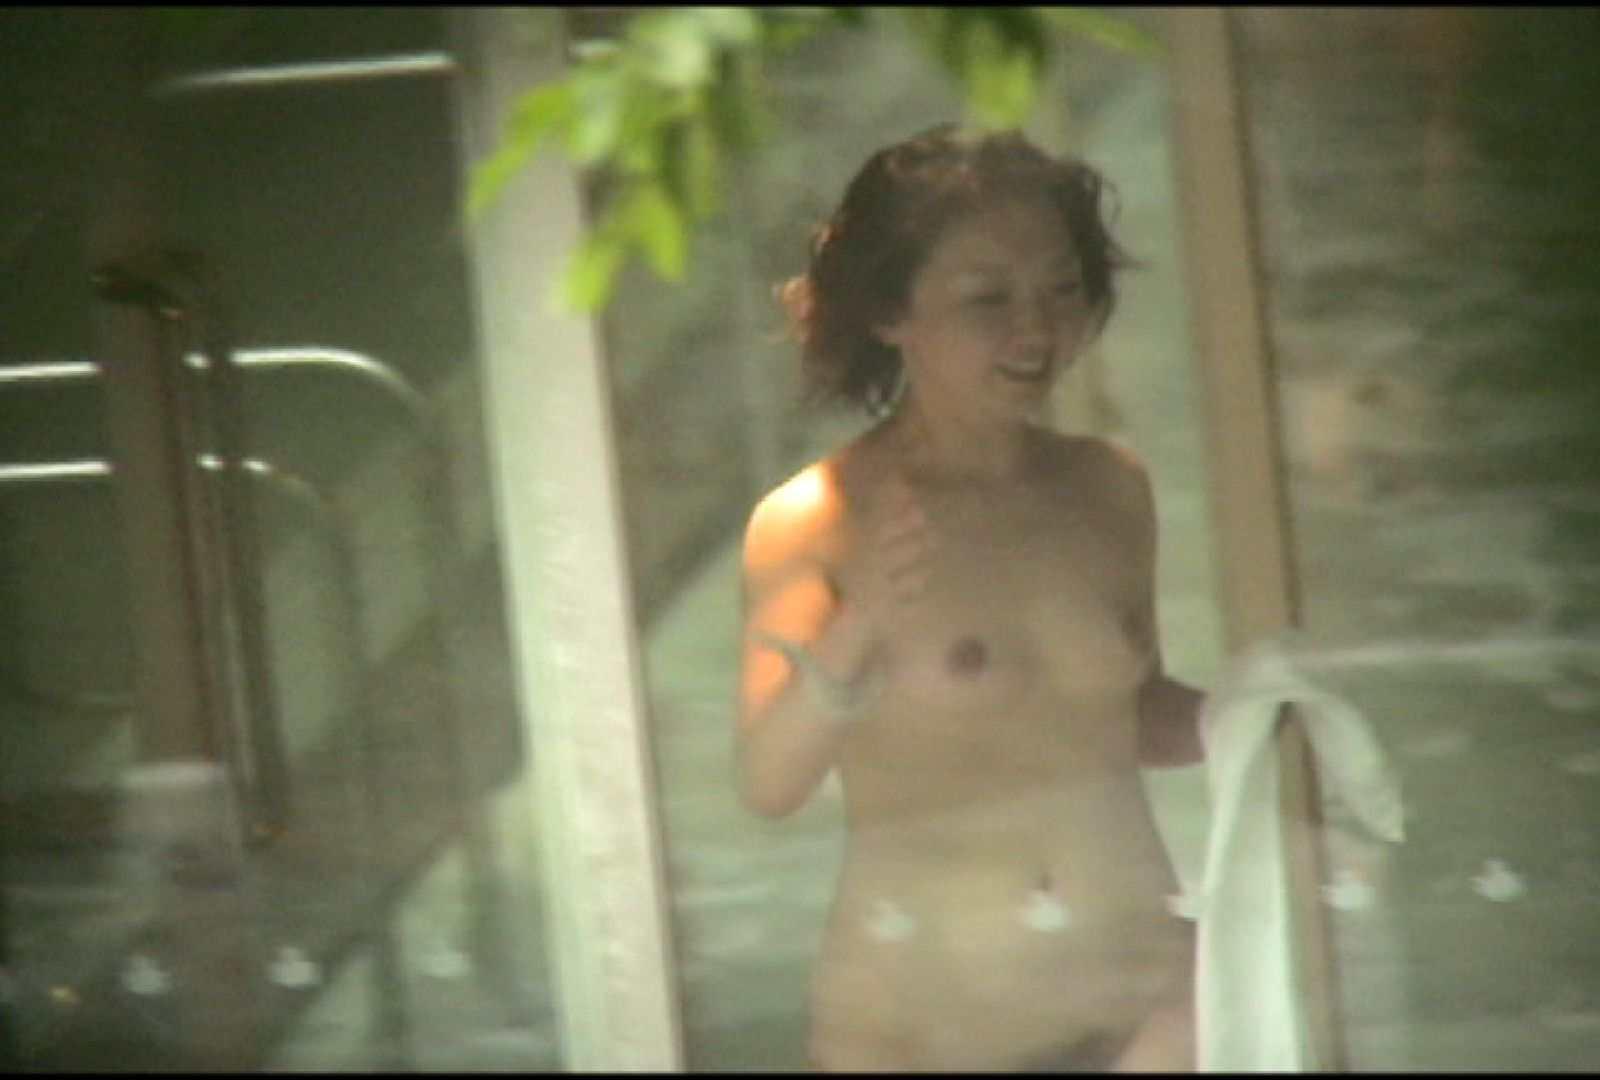 No.5 イイ笑顔ですねぇ、もう少しで割れ目さん見えたのに・・・ 美肌 セックス無修正動画無料 82枚 15